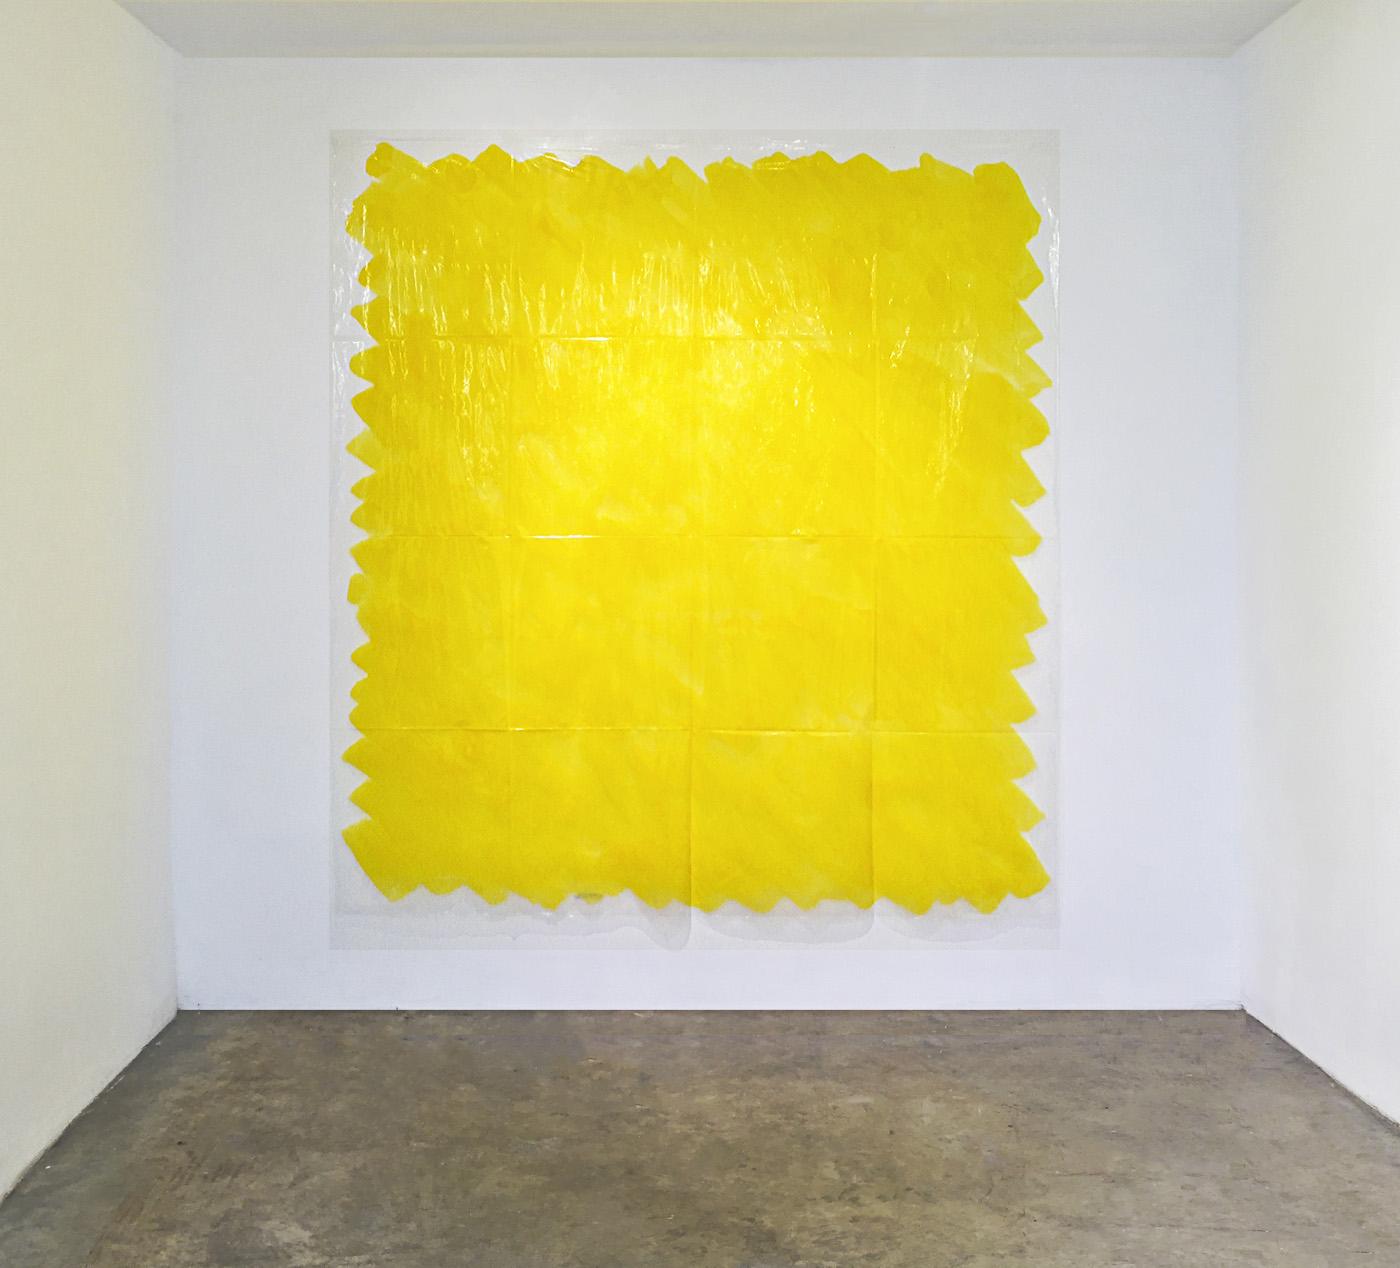 Quantitá di giallo, 1989, colored ink on transparent polyethylene, 200x 200 cm